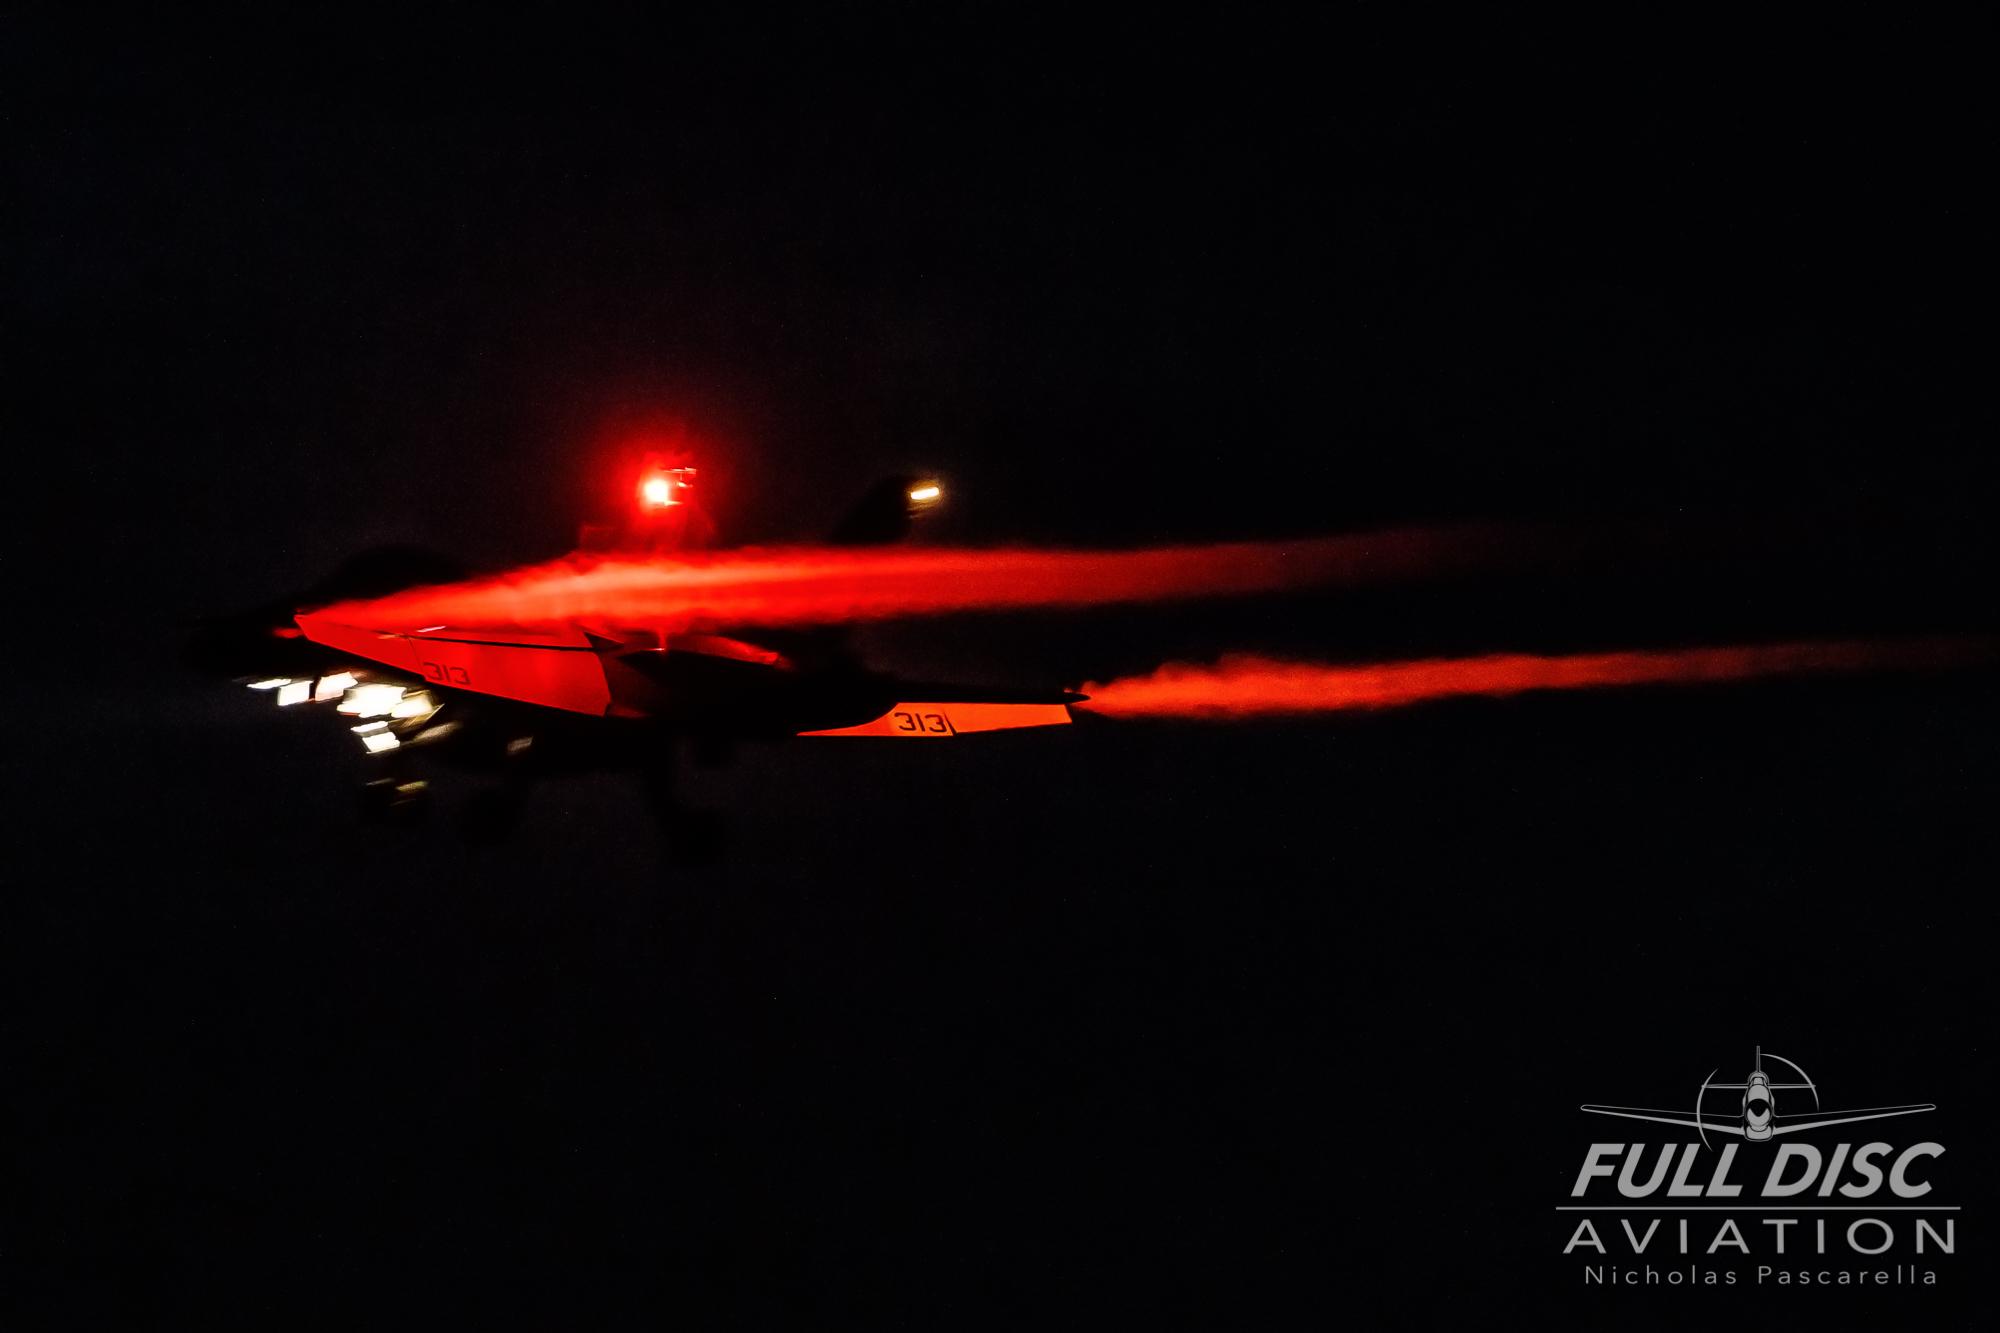 nickpascarella_nicholaspascarella_fulldiscaviation_aircraft_beacon_vapor_f18_superhornet.jpg